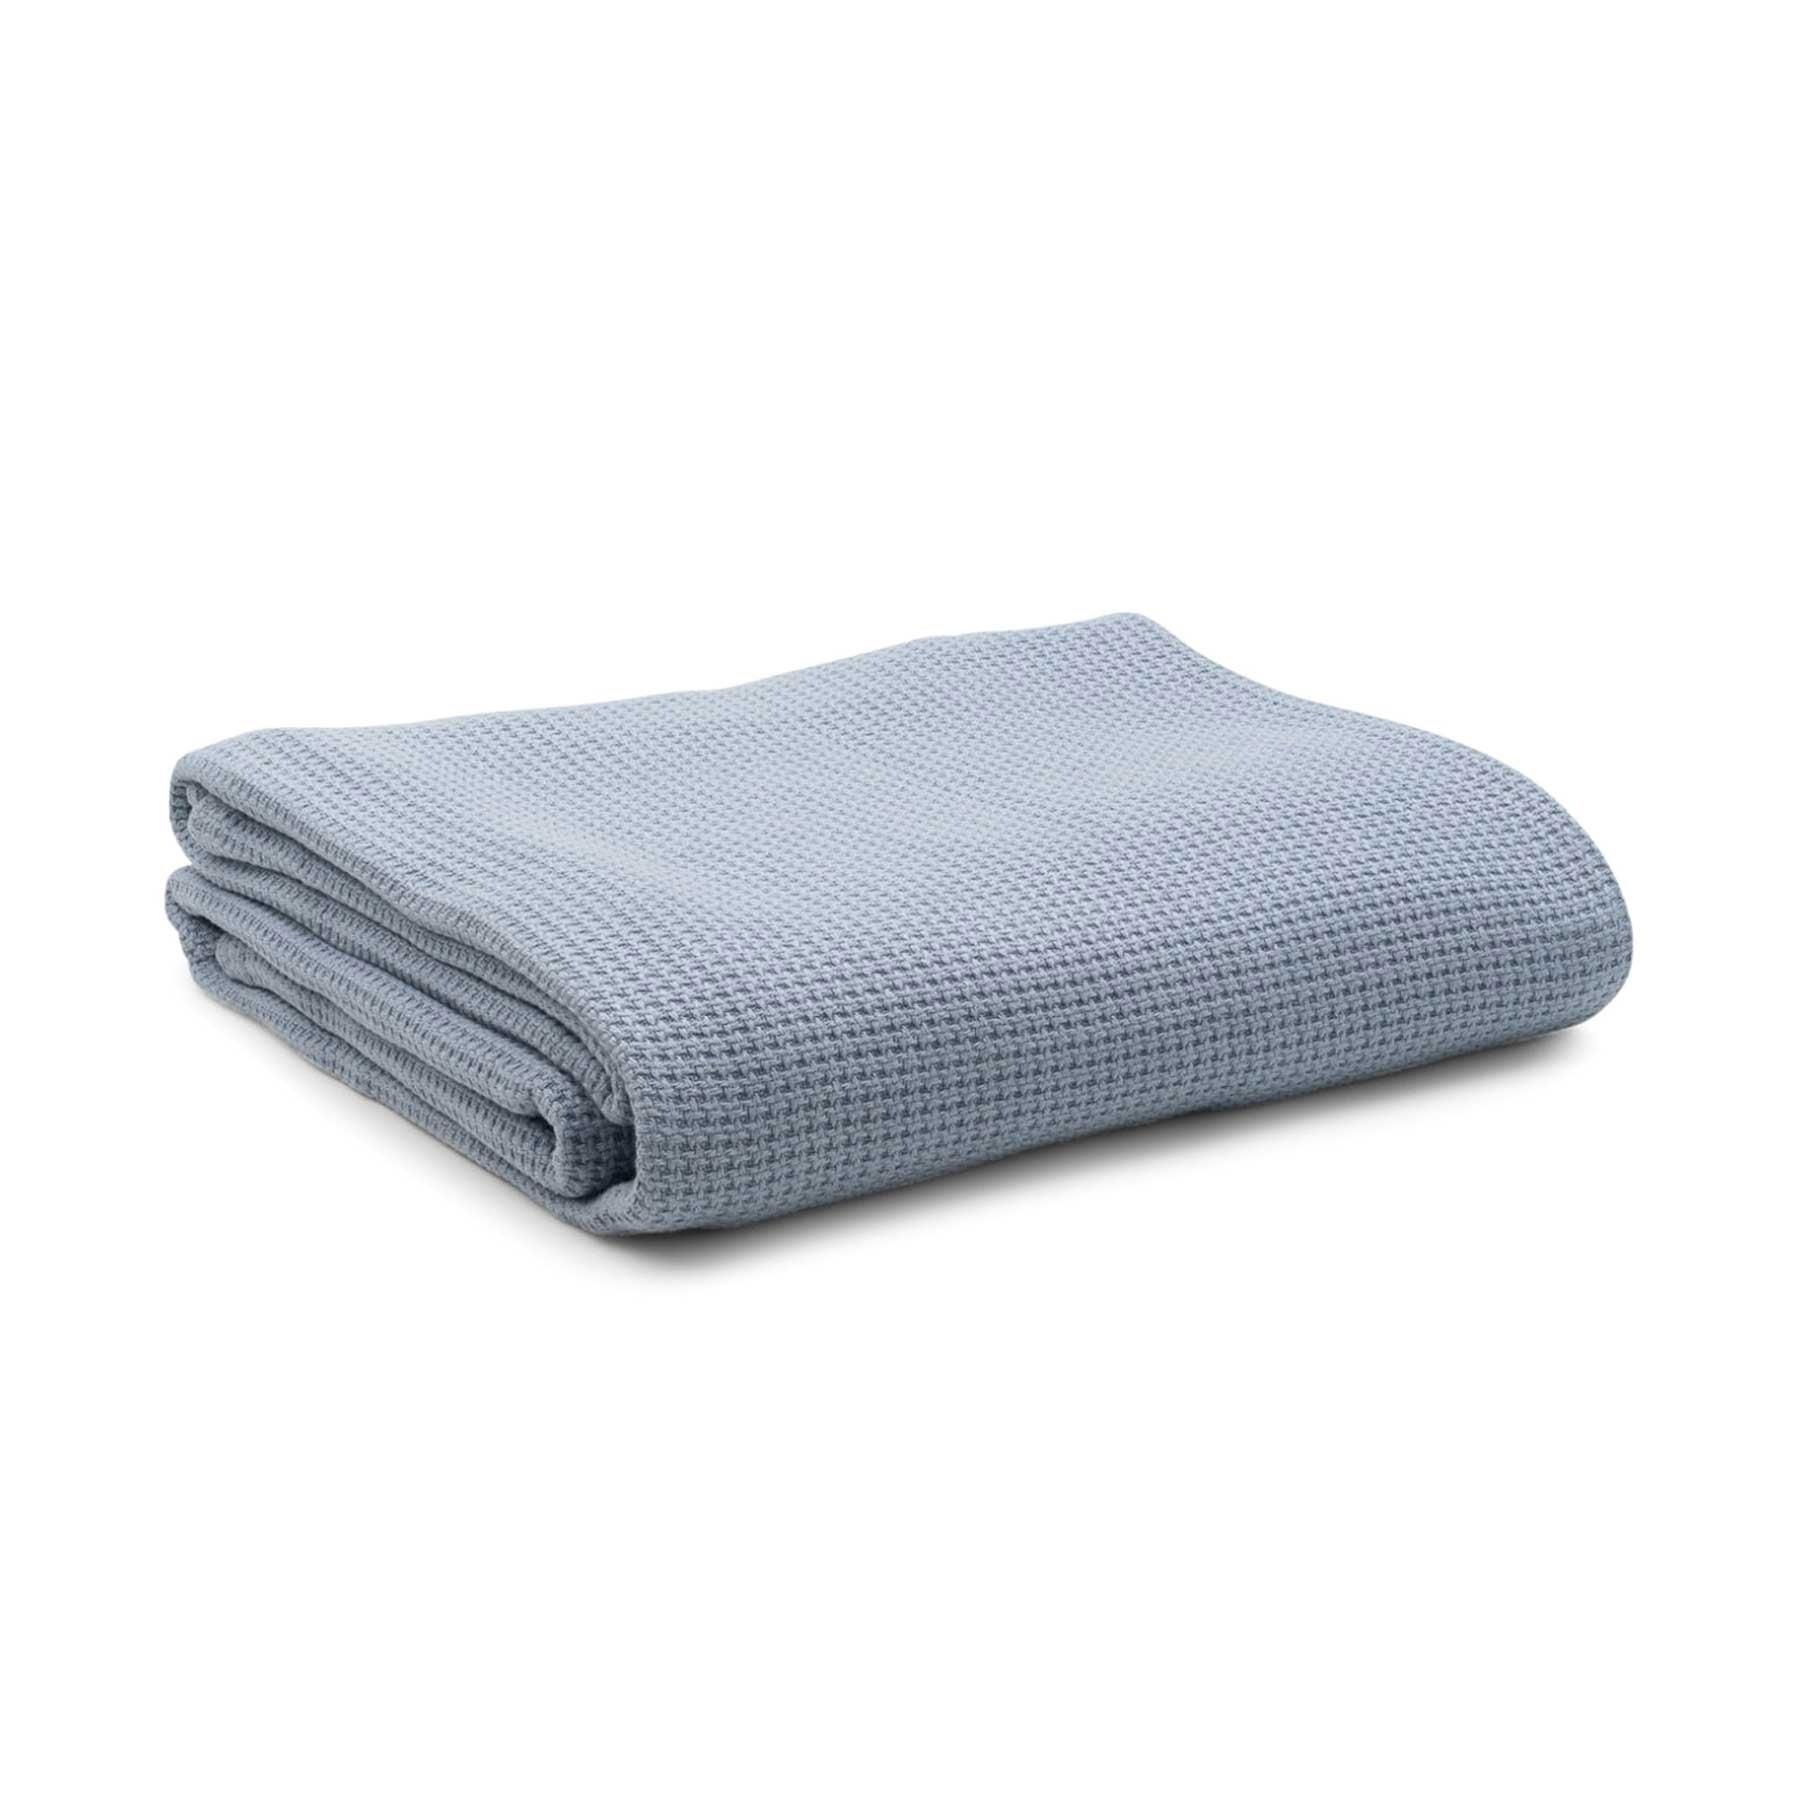 Pure Bamboo Cotton Blanket Light Blue by Onkaparinga